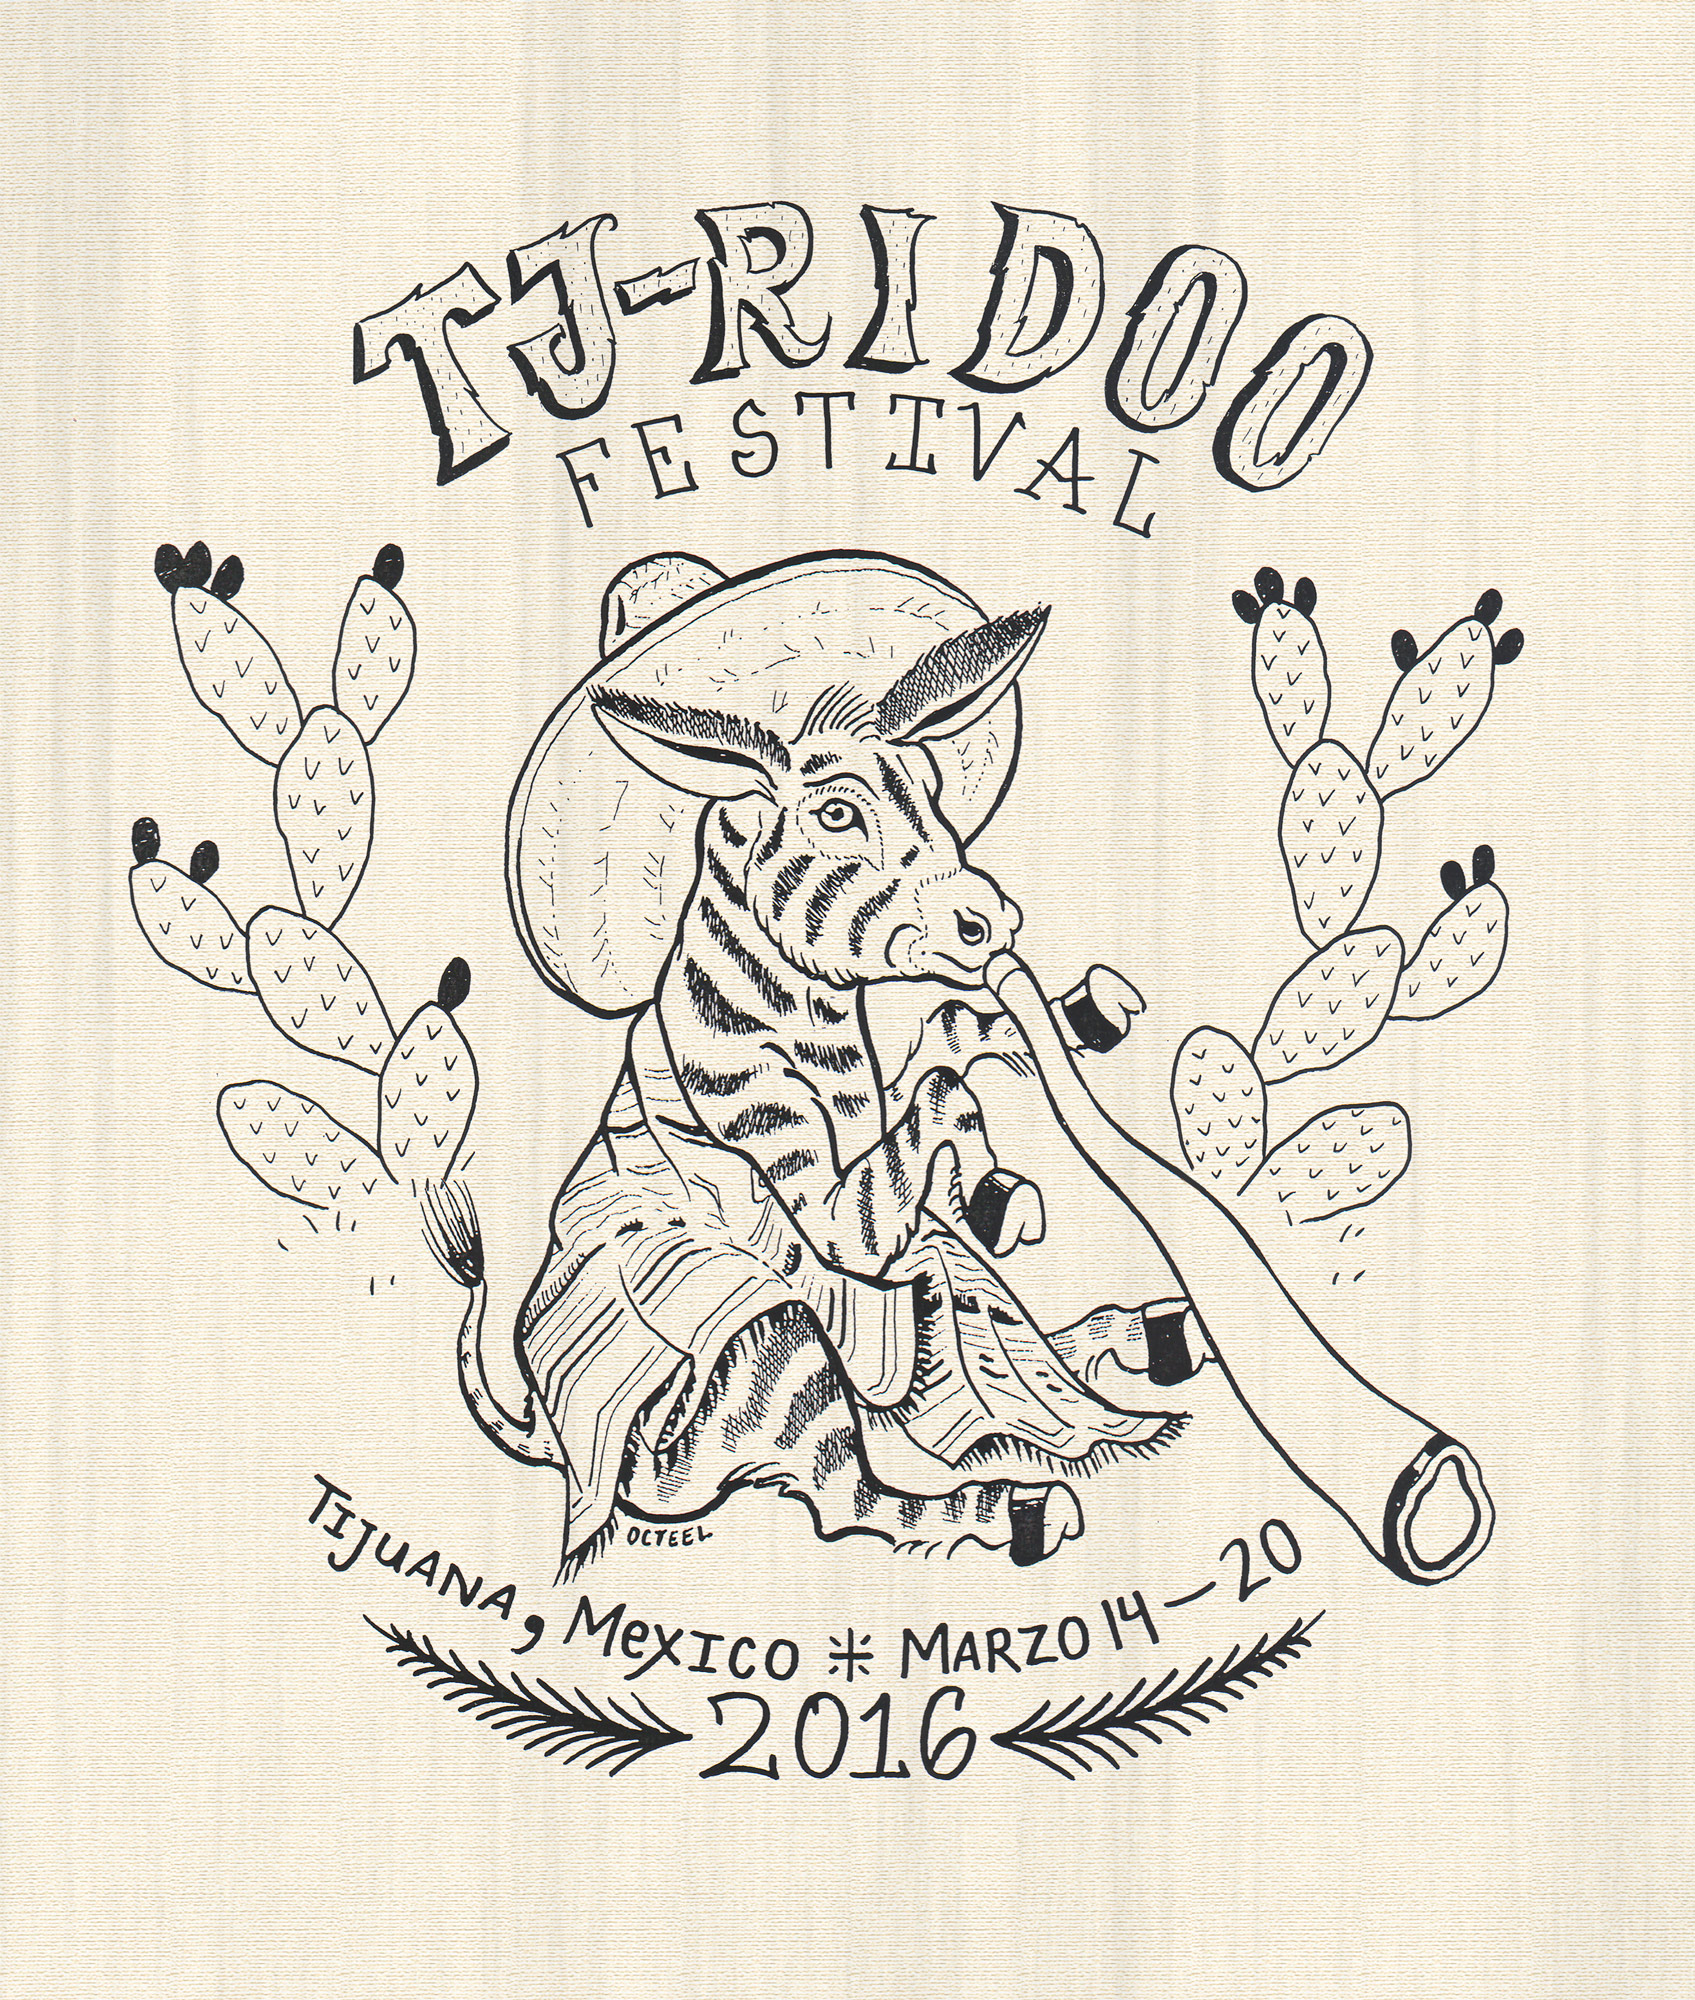 TJRIDOO Mexico Didgeridoo festival